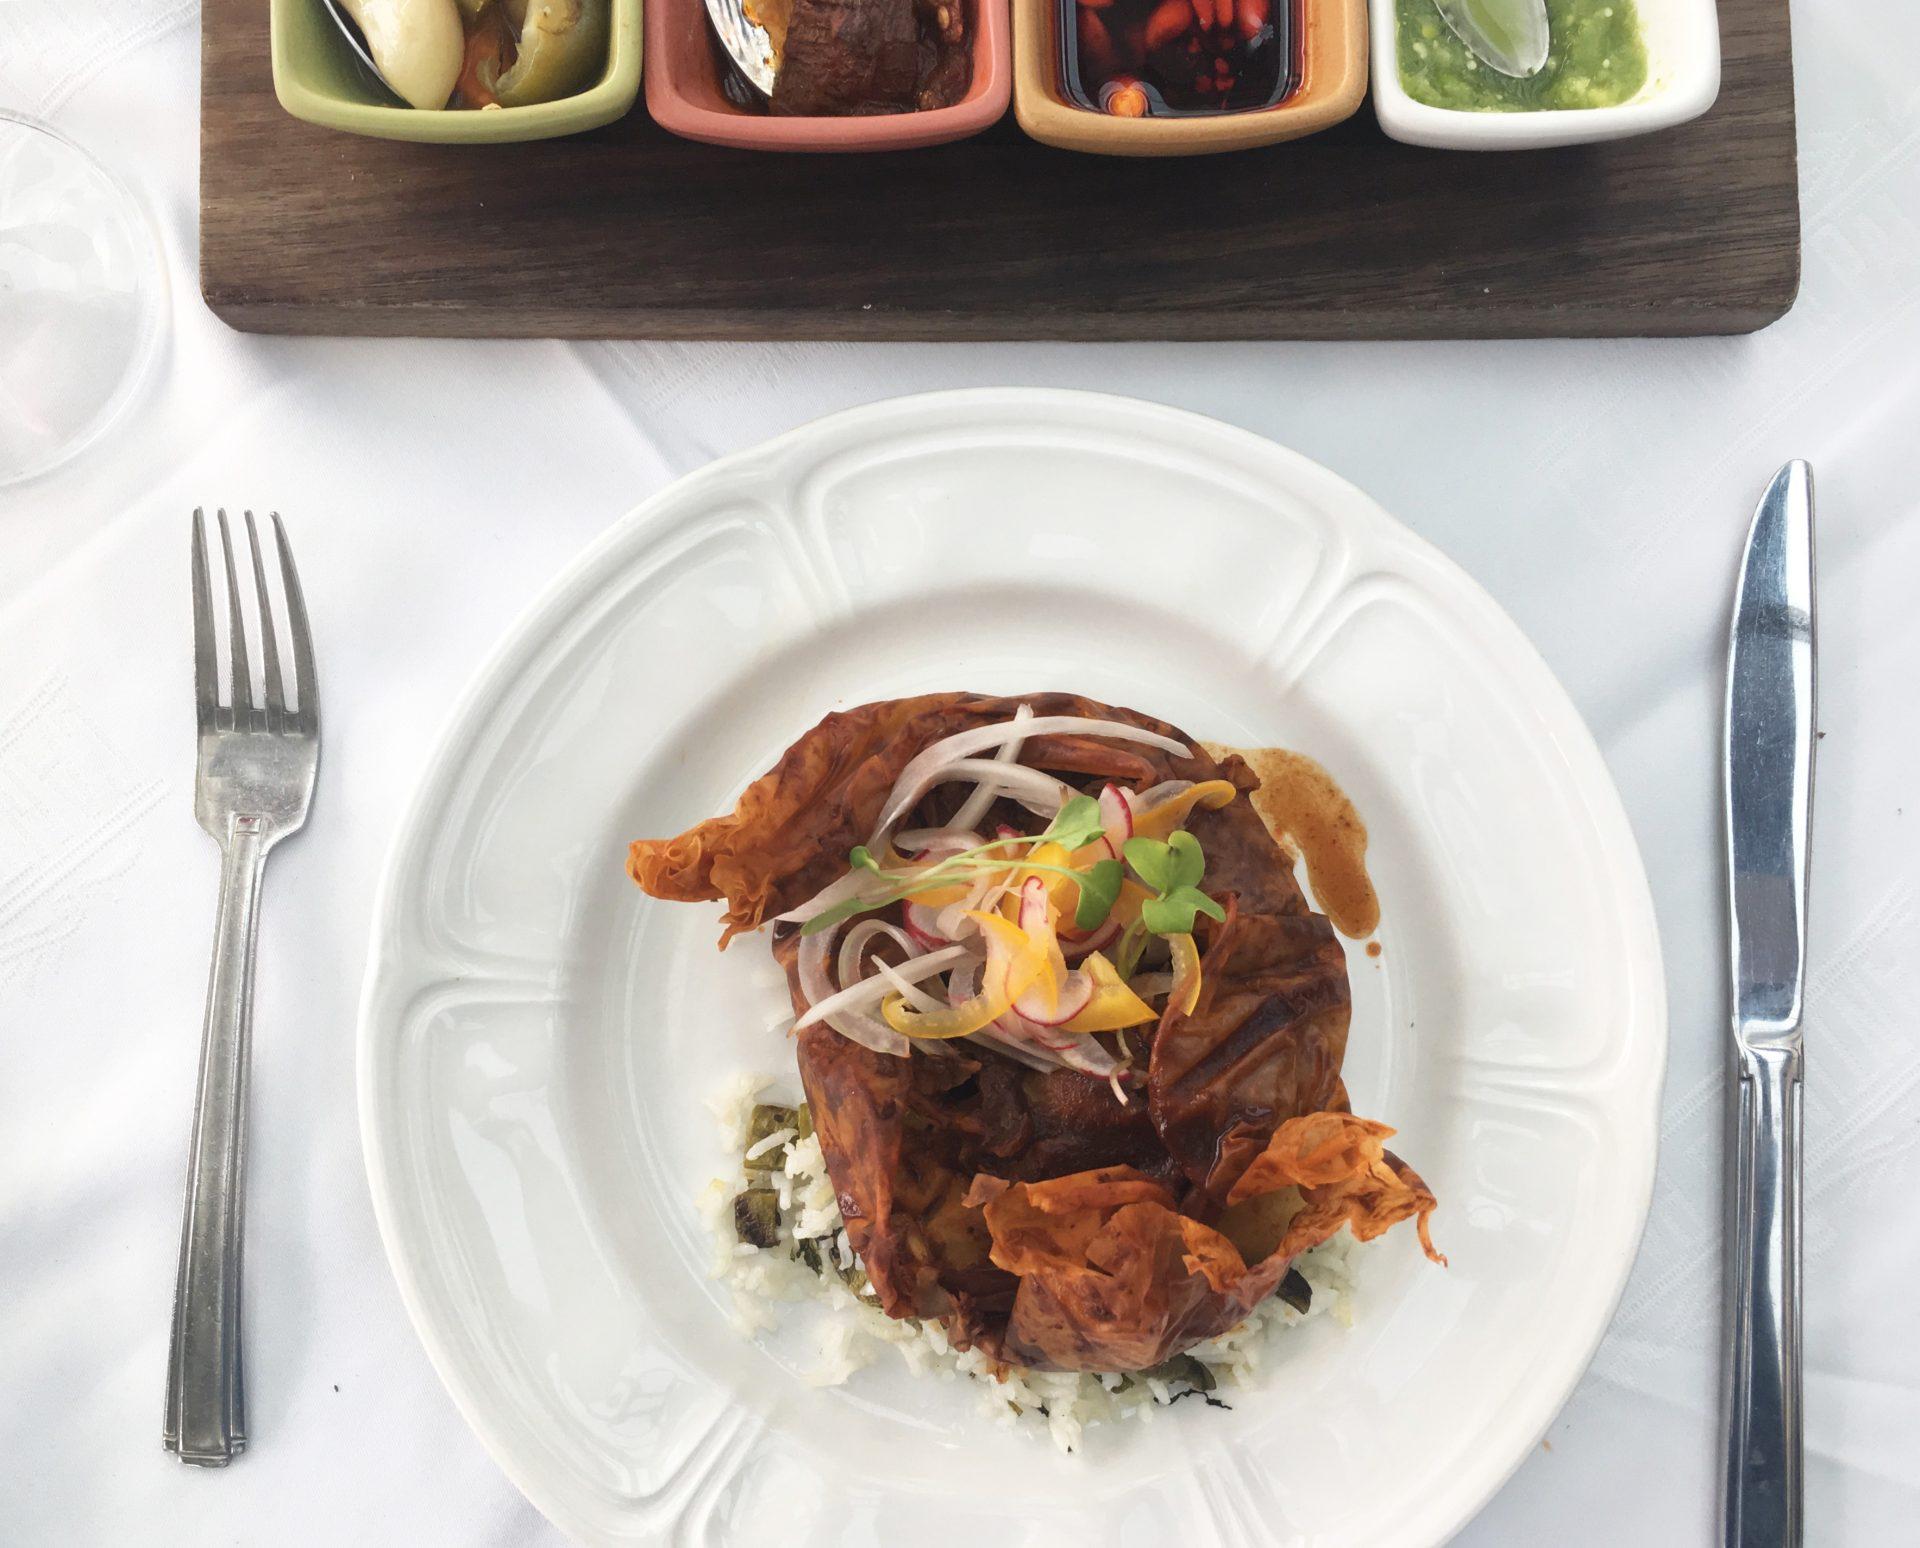 El chef Aquiles Chávez toma La Cantina Polanco